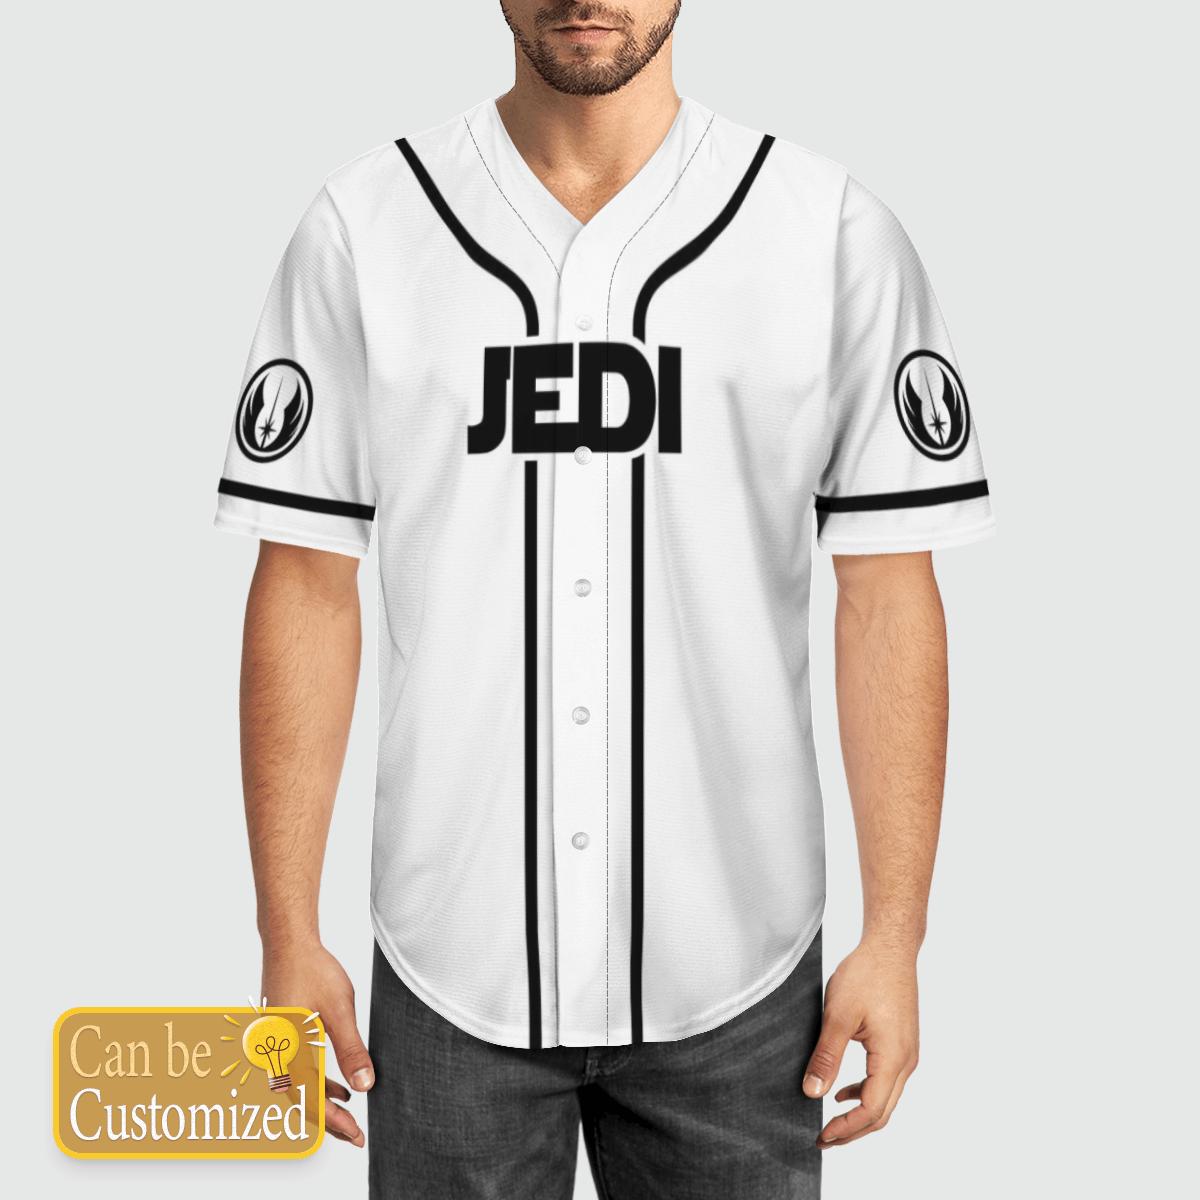 Jedi Star Wars custom name baseball shirt 2